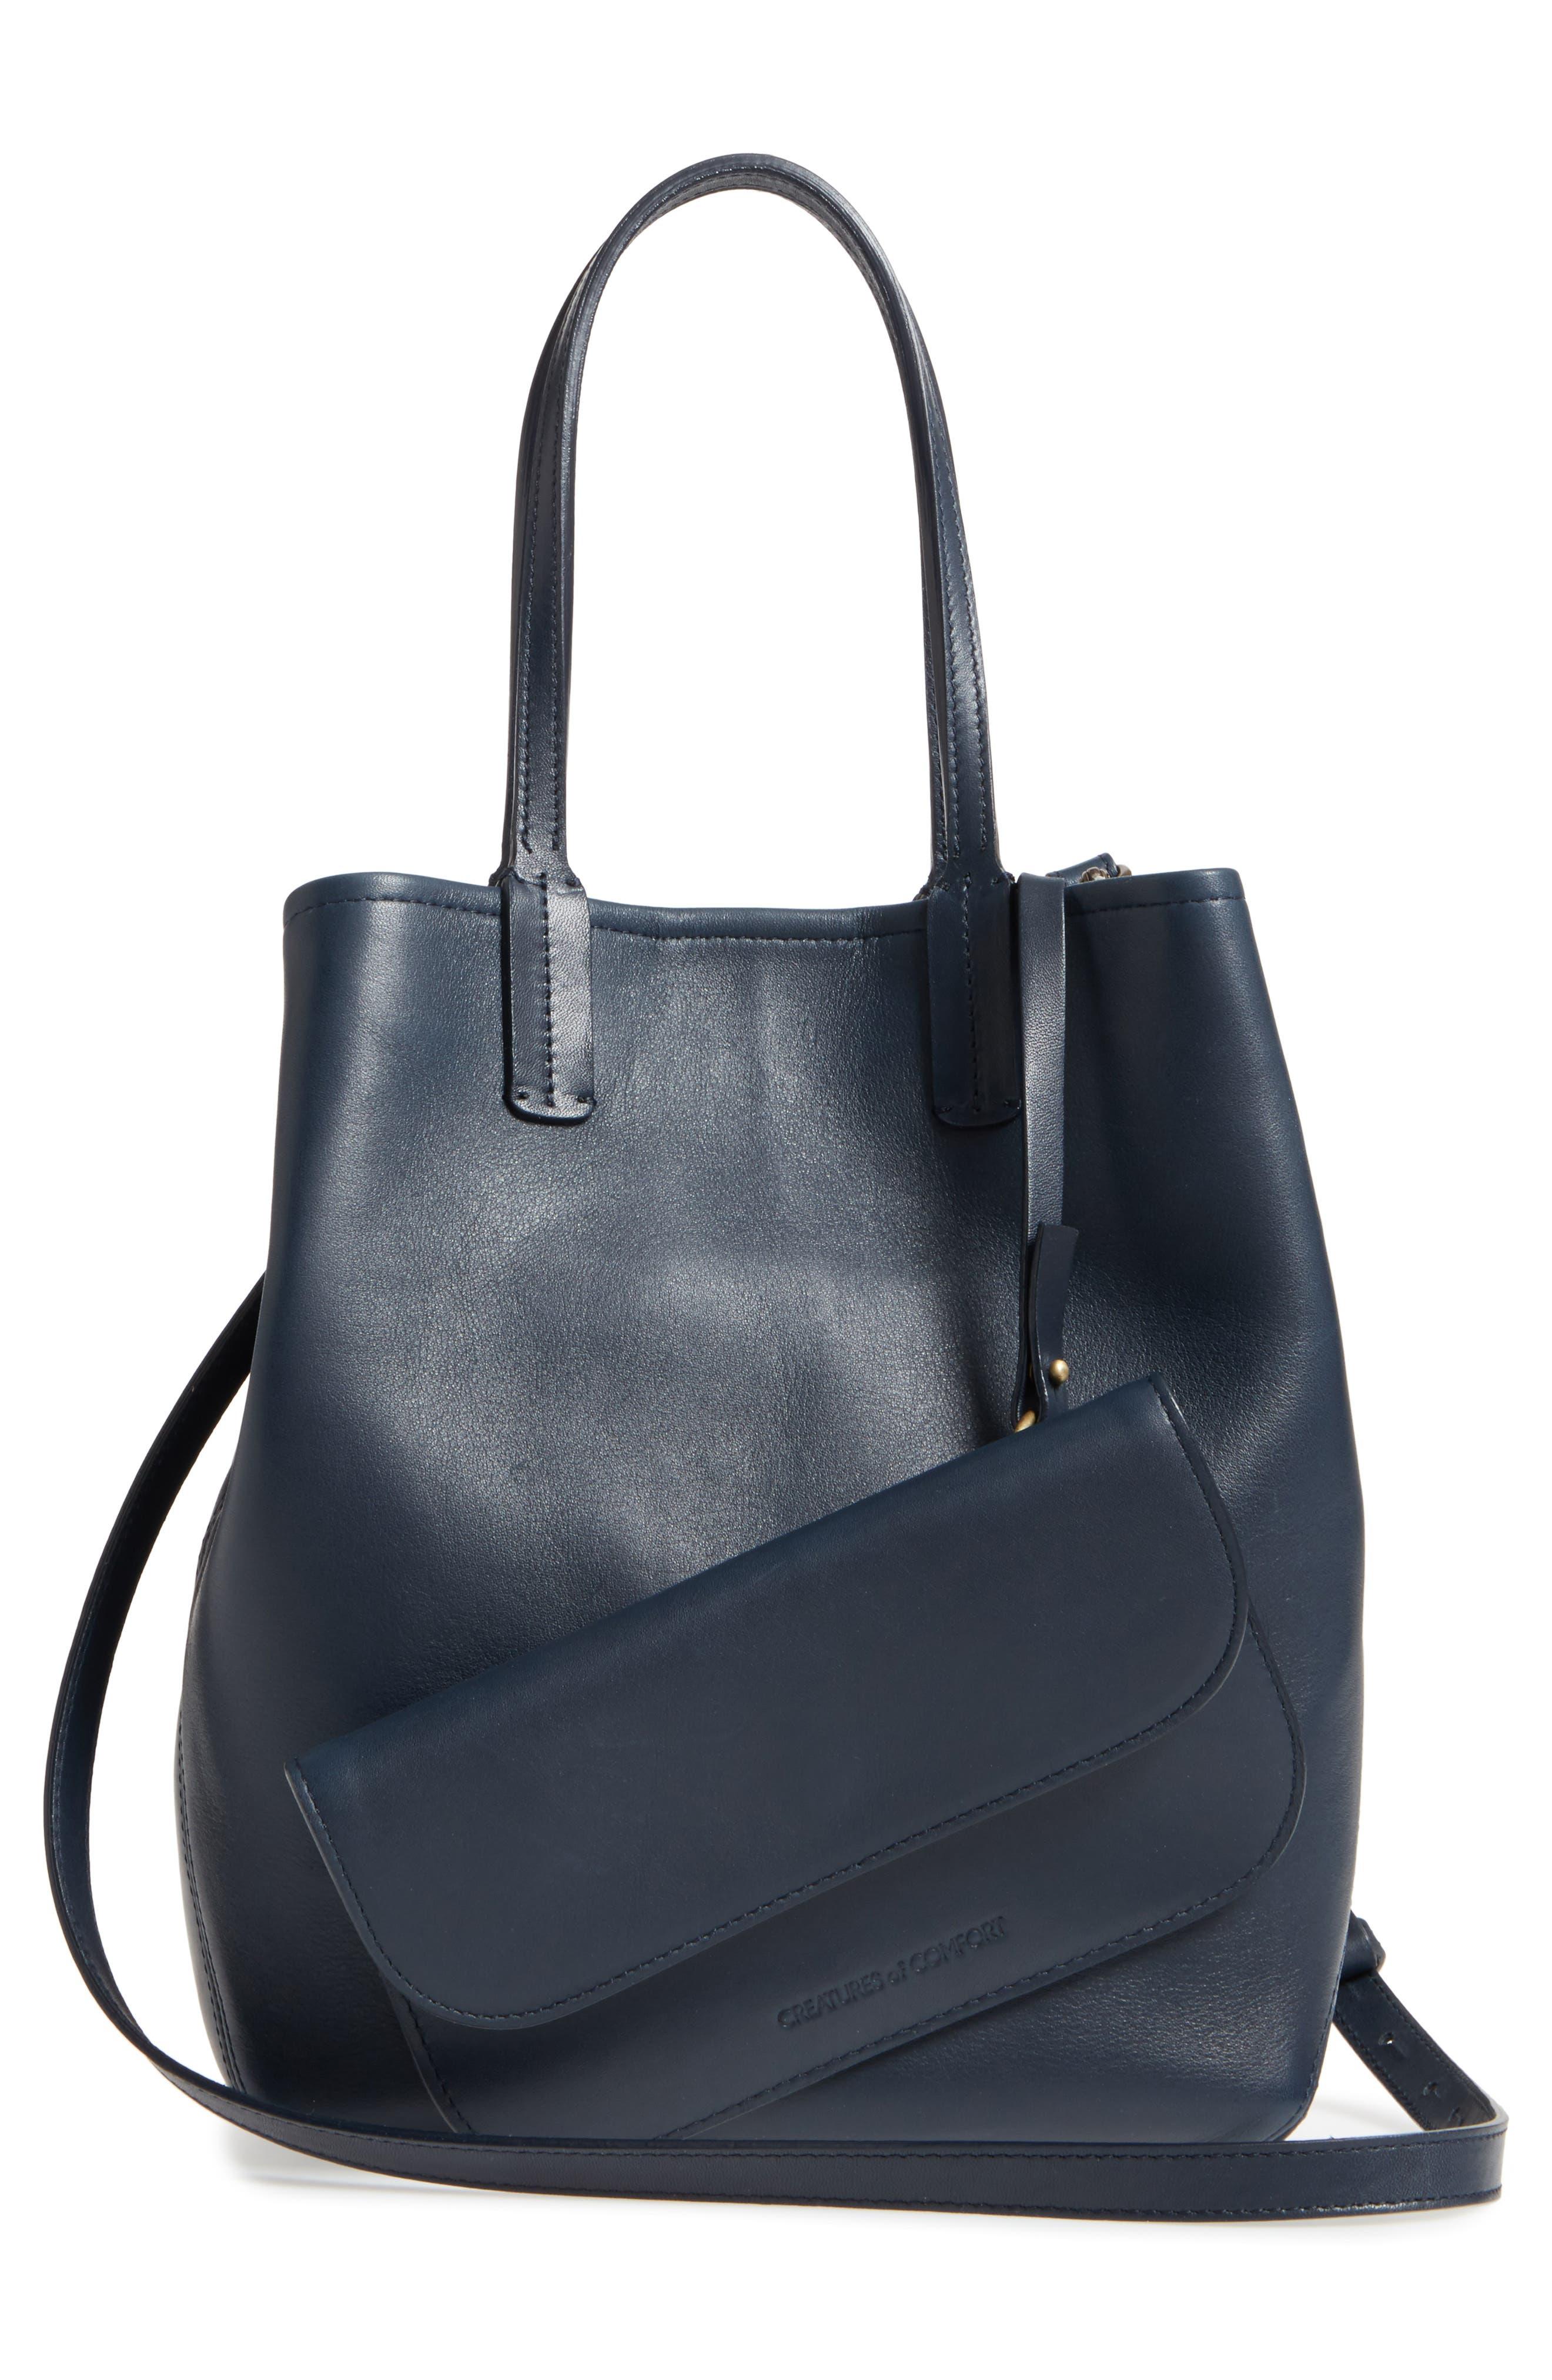 Tiny Julia Shoulder Bag,                             Alternate thumbnail 3, color,                             001